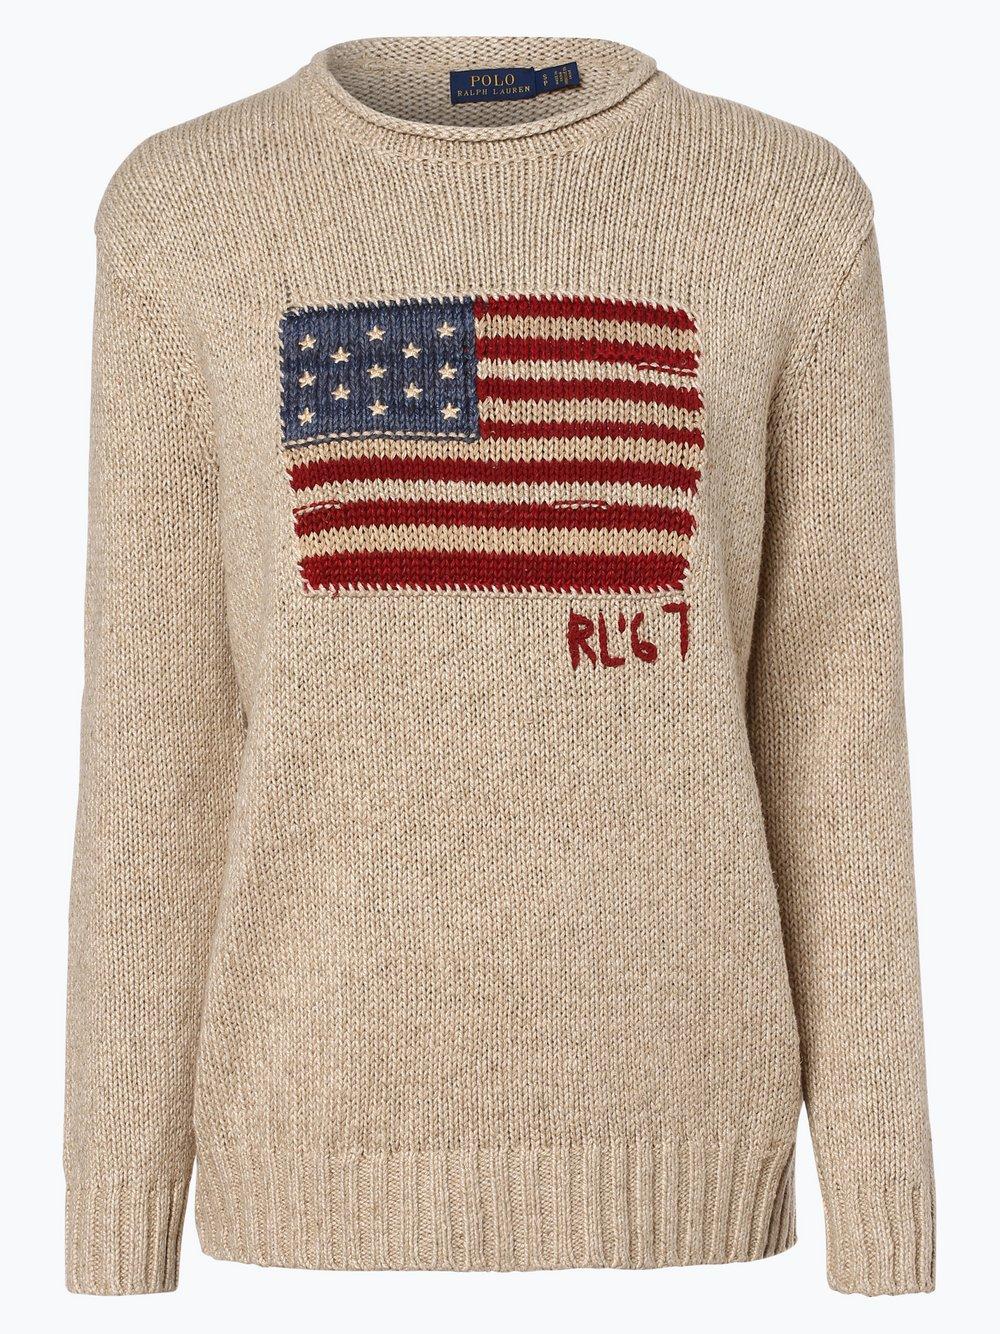 huge discount b2a68 87866 Polo Ralph Lauren Damen Pullover mit Leinen-Anteil online ...